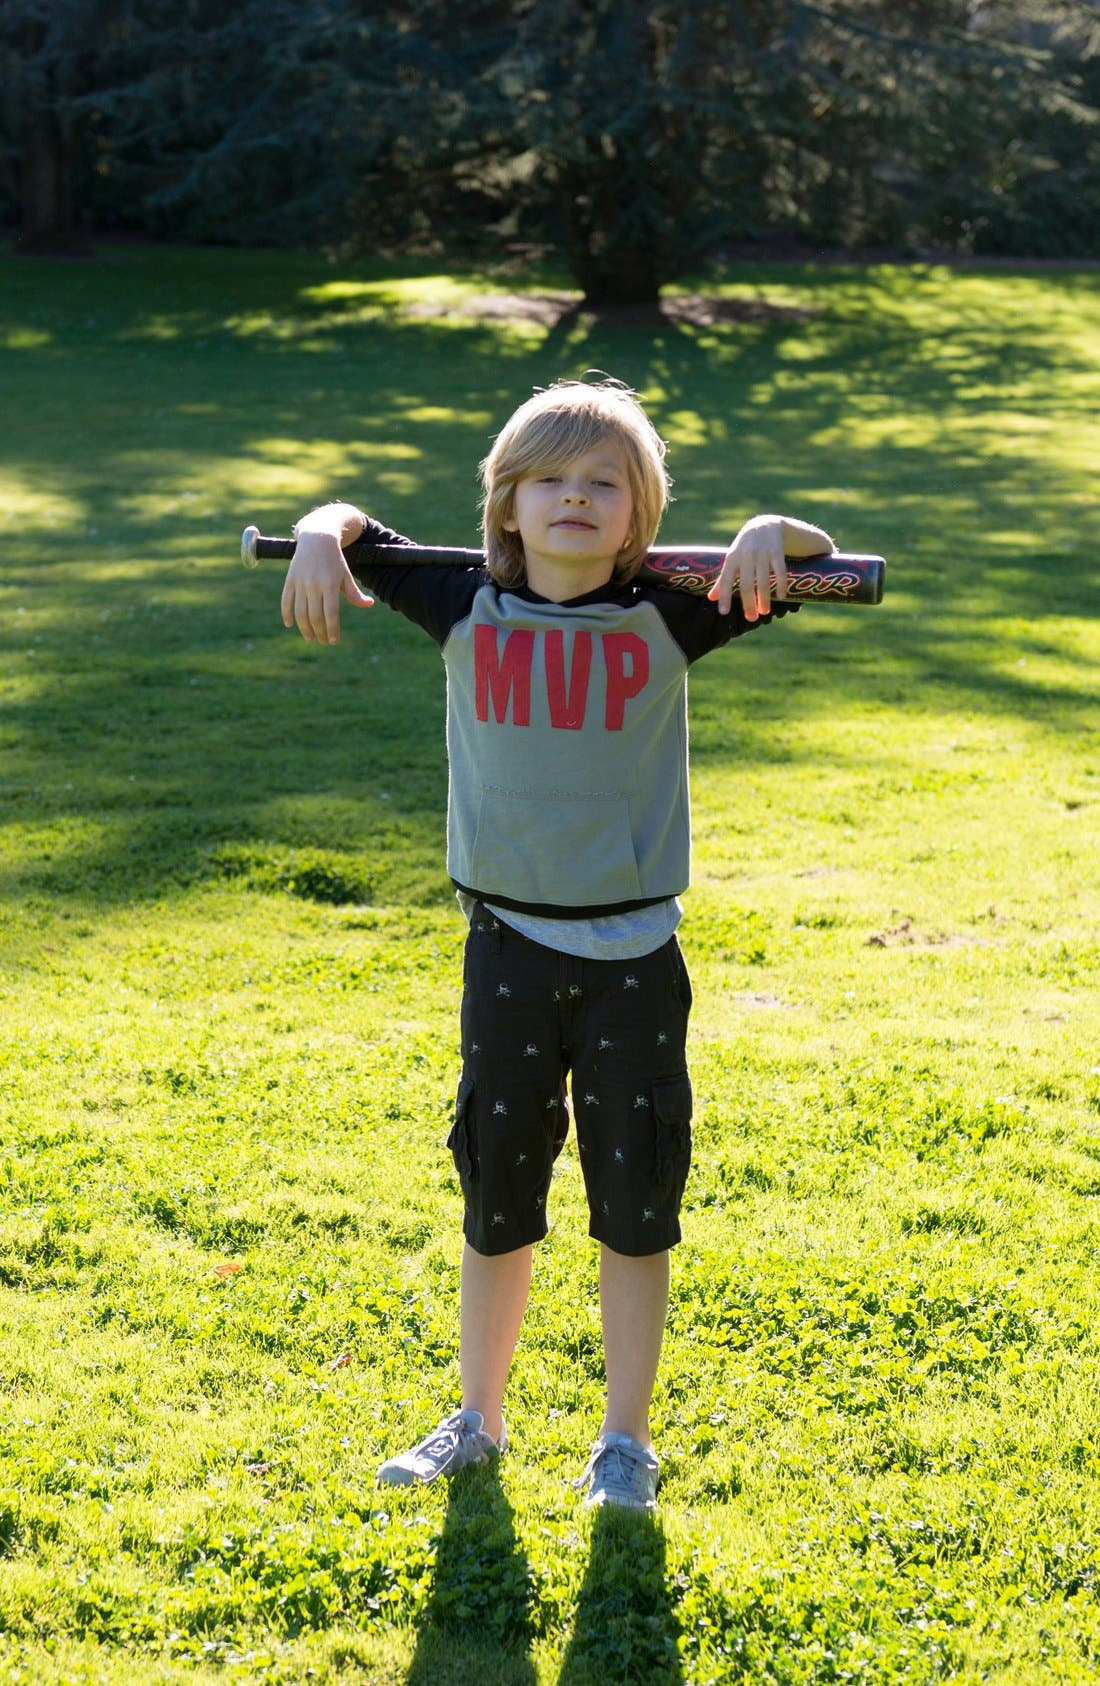 Alternate Image 3  - Peek 'MVP' Hoodie (Toddler Boys, Little Boys & Big Boys)